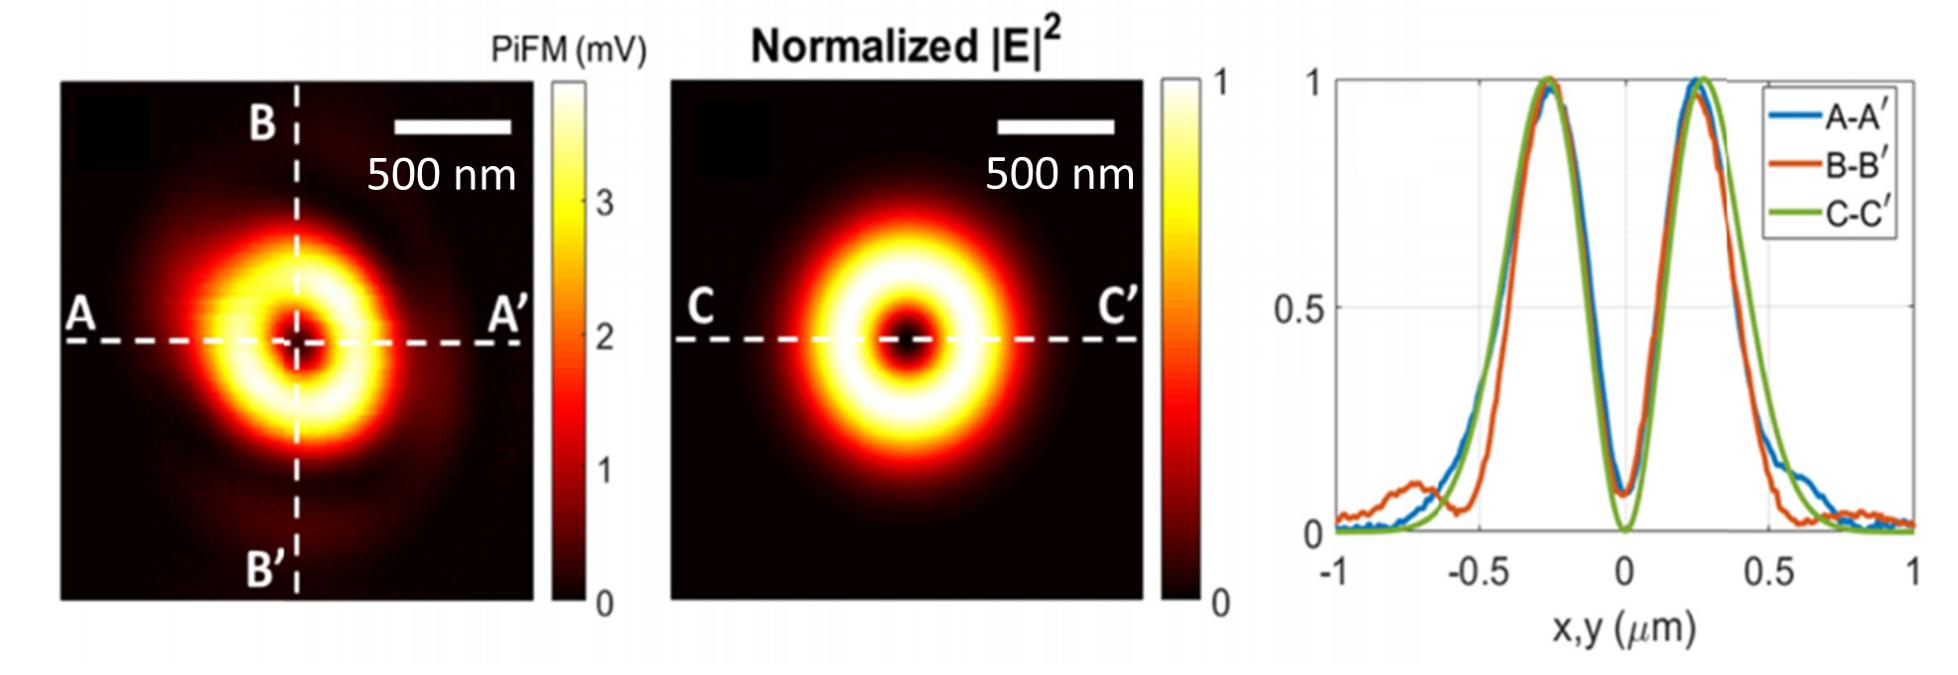 Symmetric characterization of an azimuthally polarized beam (APB) with AuNP PiFM